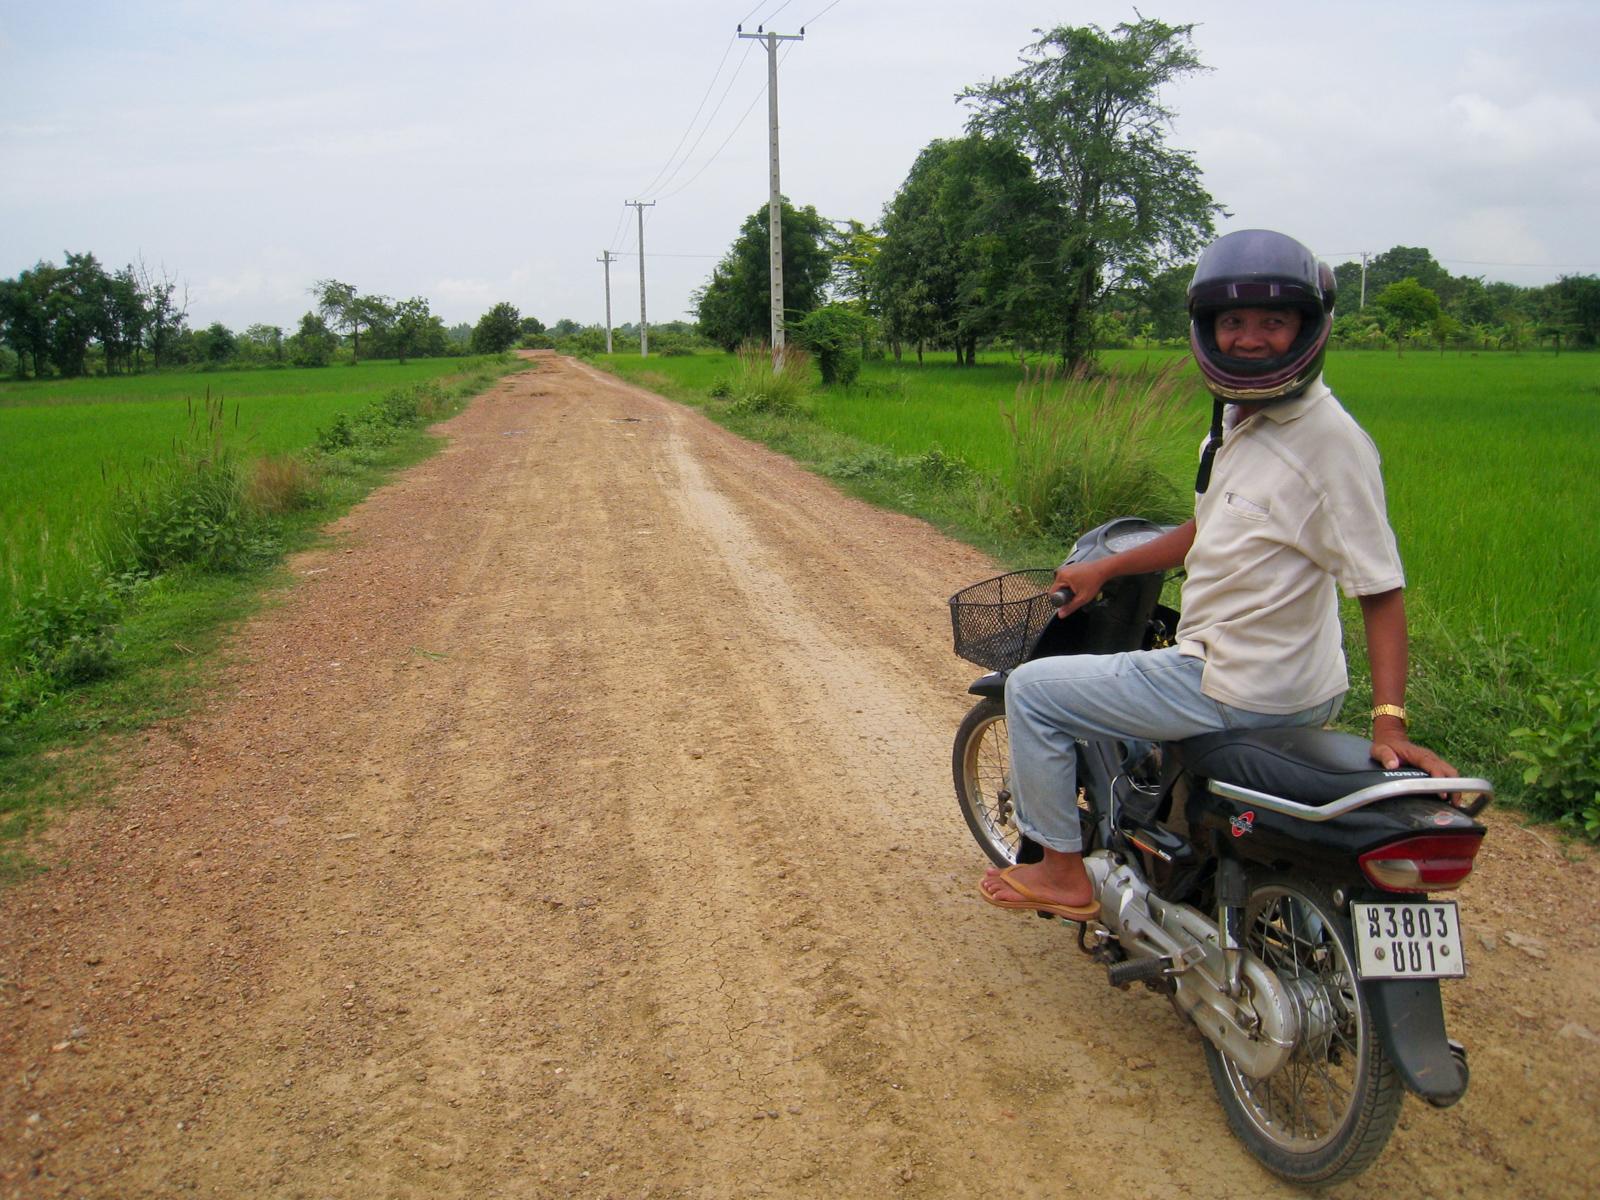 Phi-Lay, my Cambodian guide, on his motorbike outside Battambang